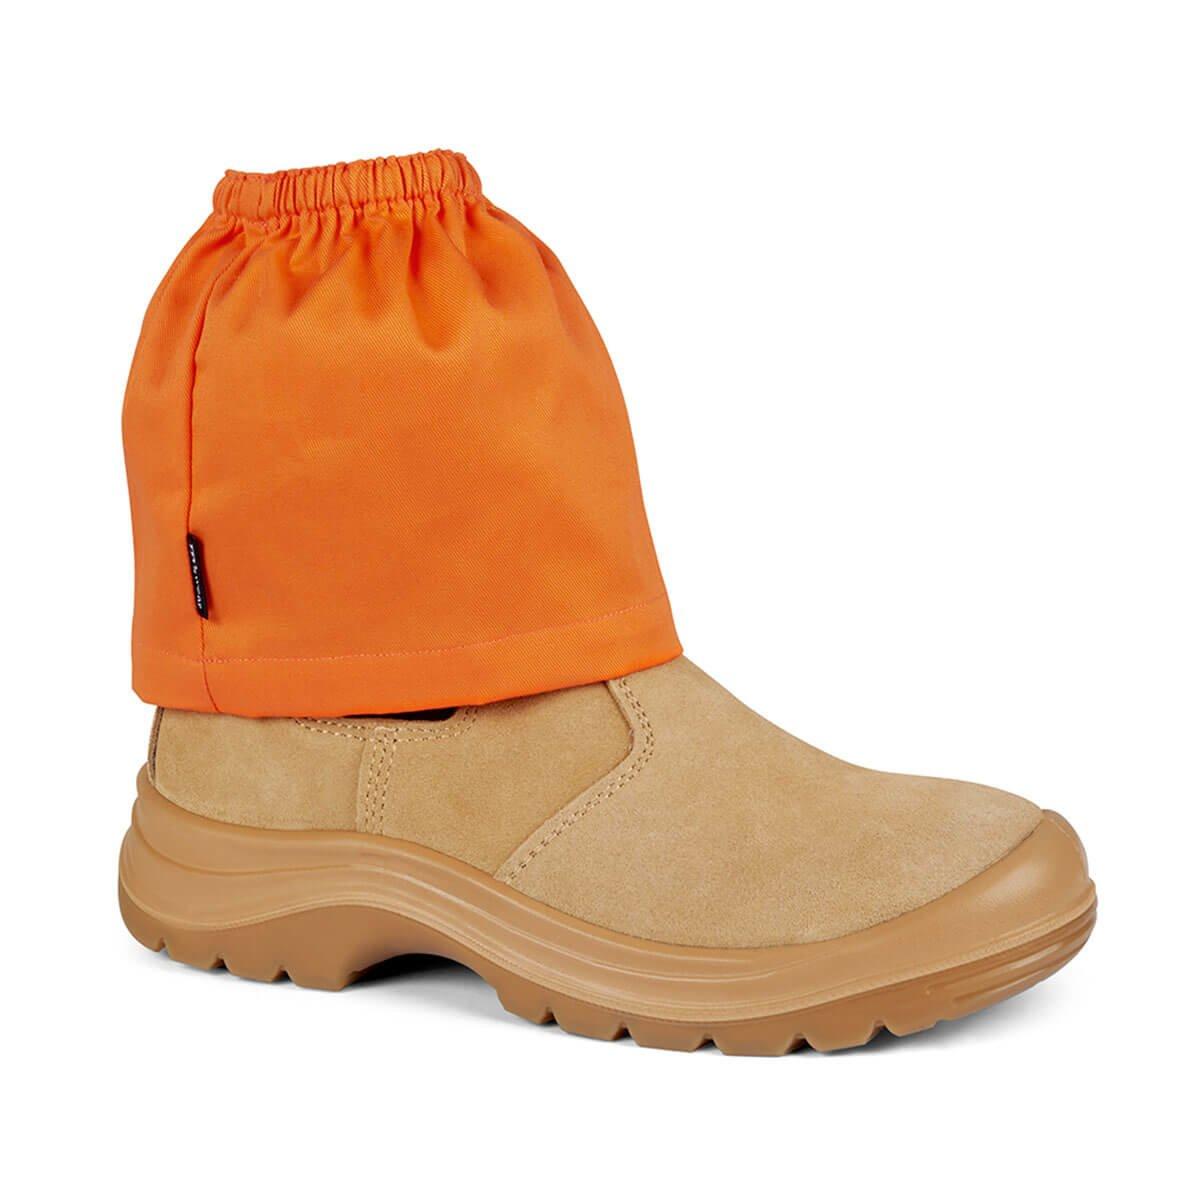 Boot Cover-Orange